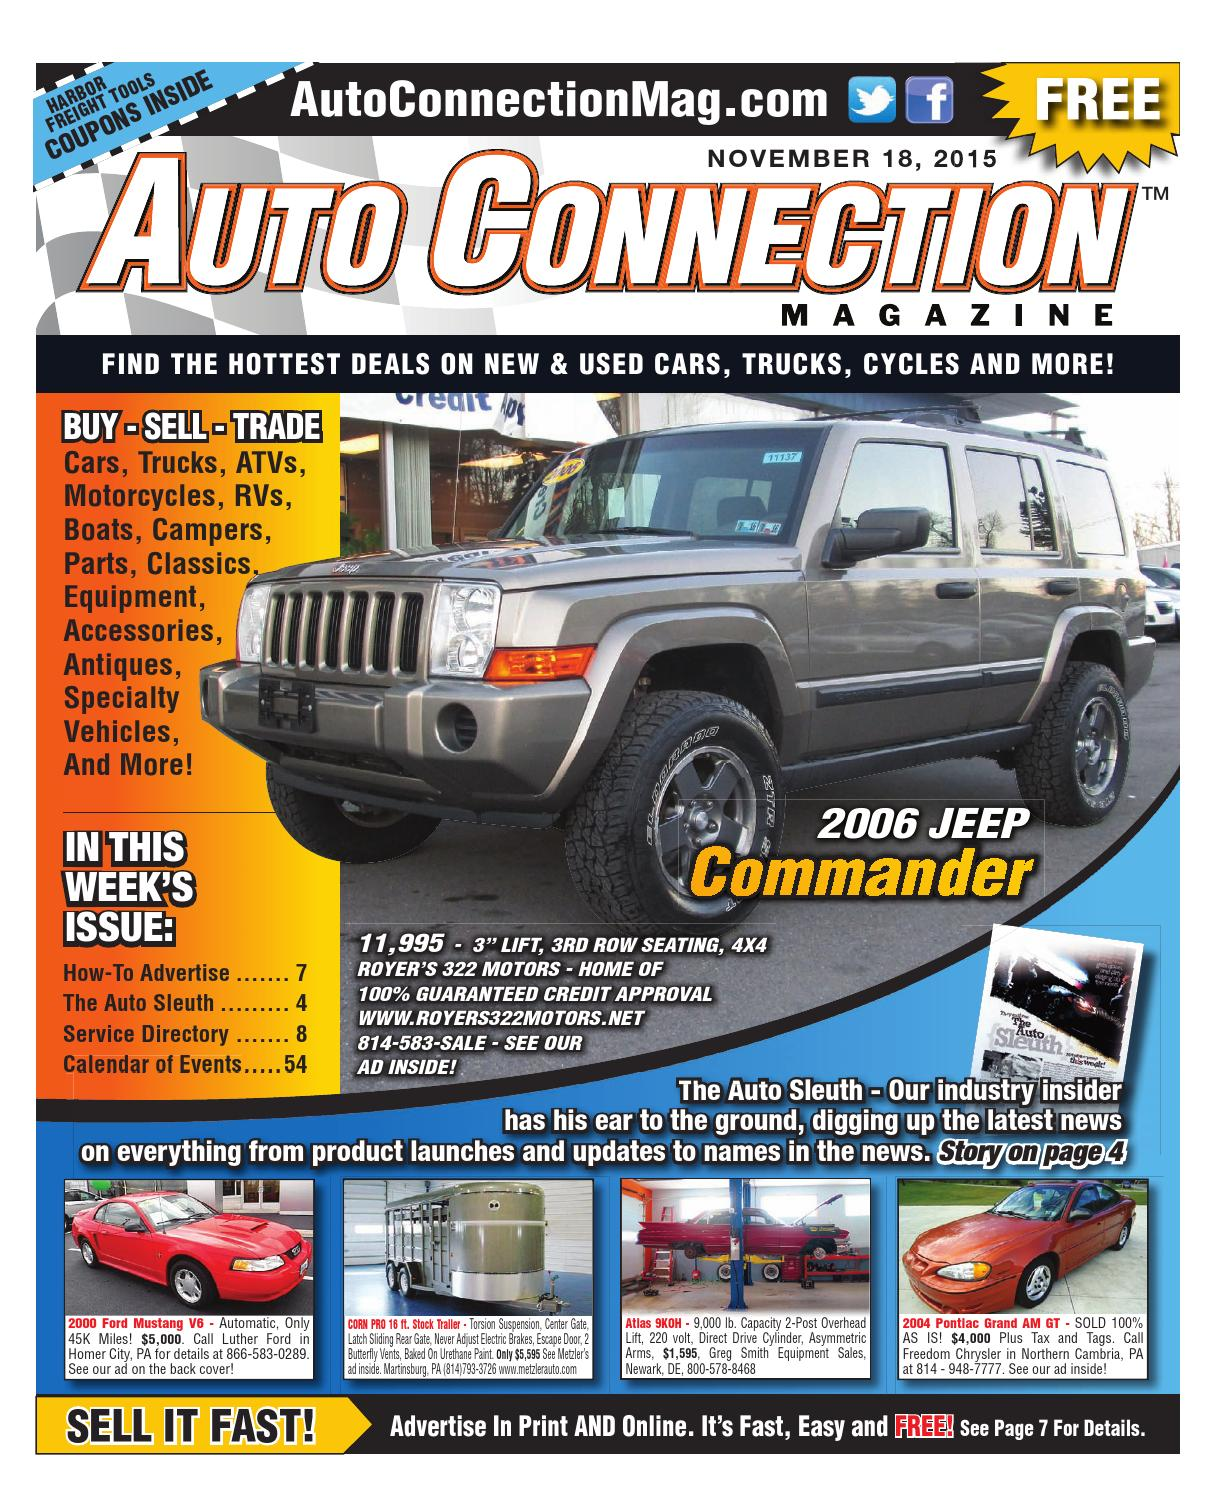 11 18 15 Auto Connection Magazine By Issuu 0 Dodge Dakota Custom Fit Vehicle Wiring Tow Ready